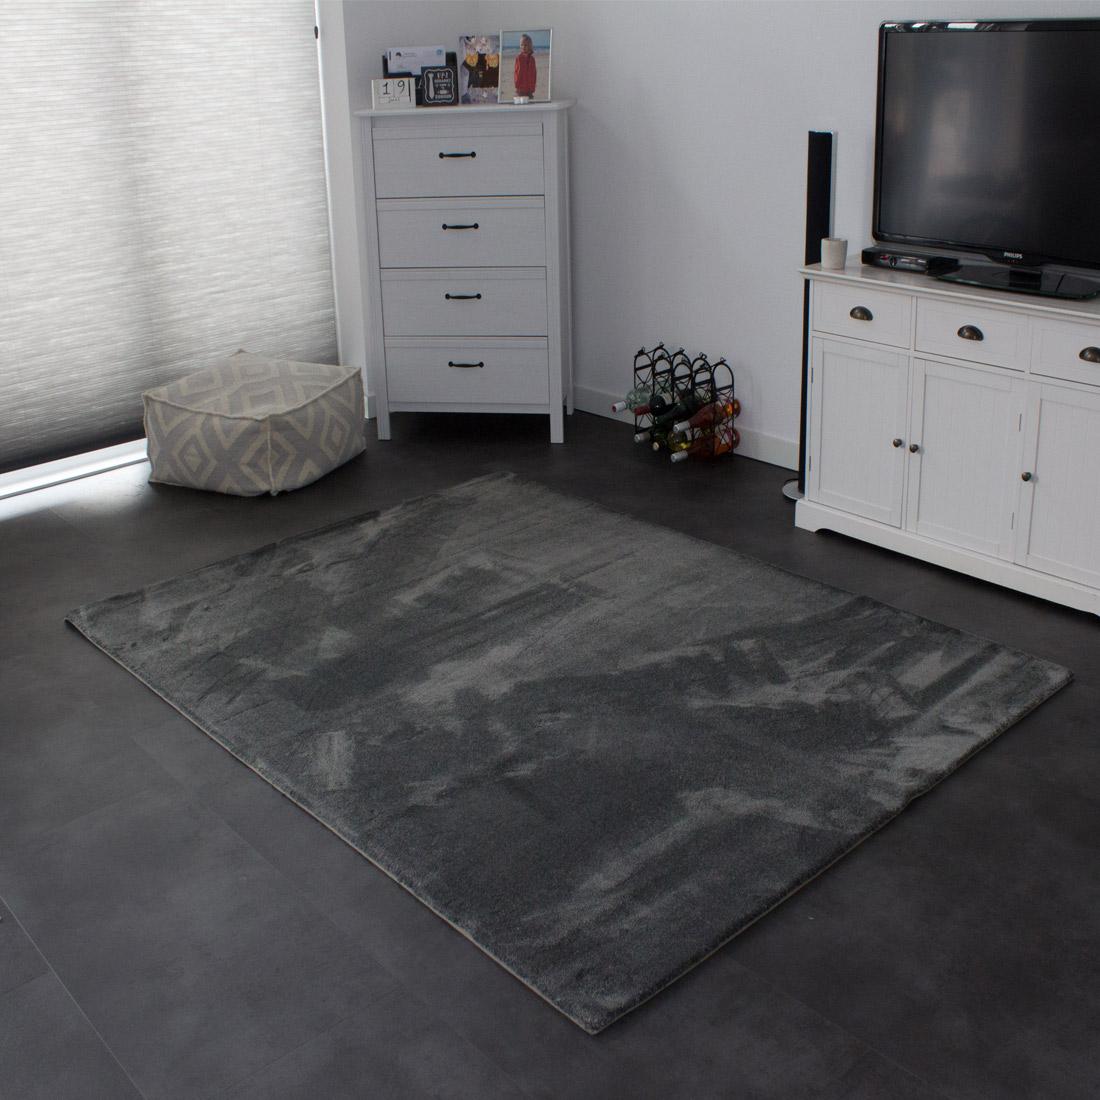 Vloerkleed Xilento Soft Basalt | 200 x 300 cm